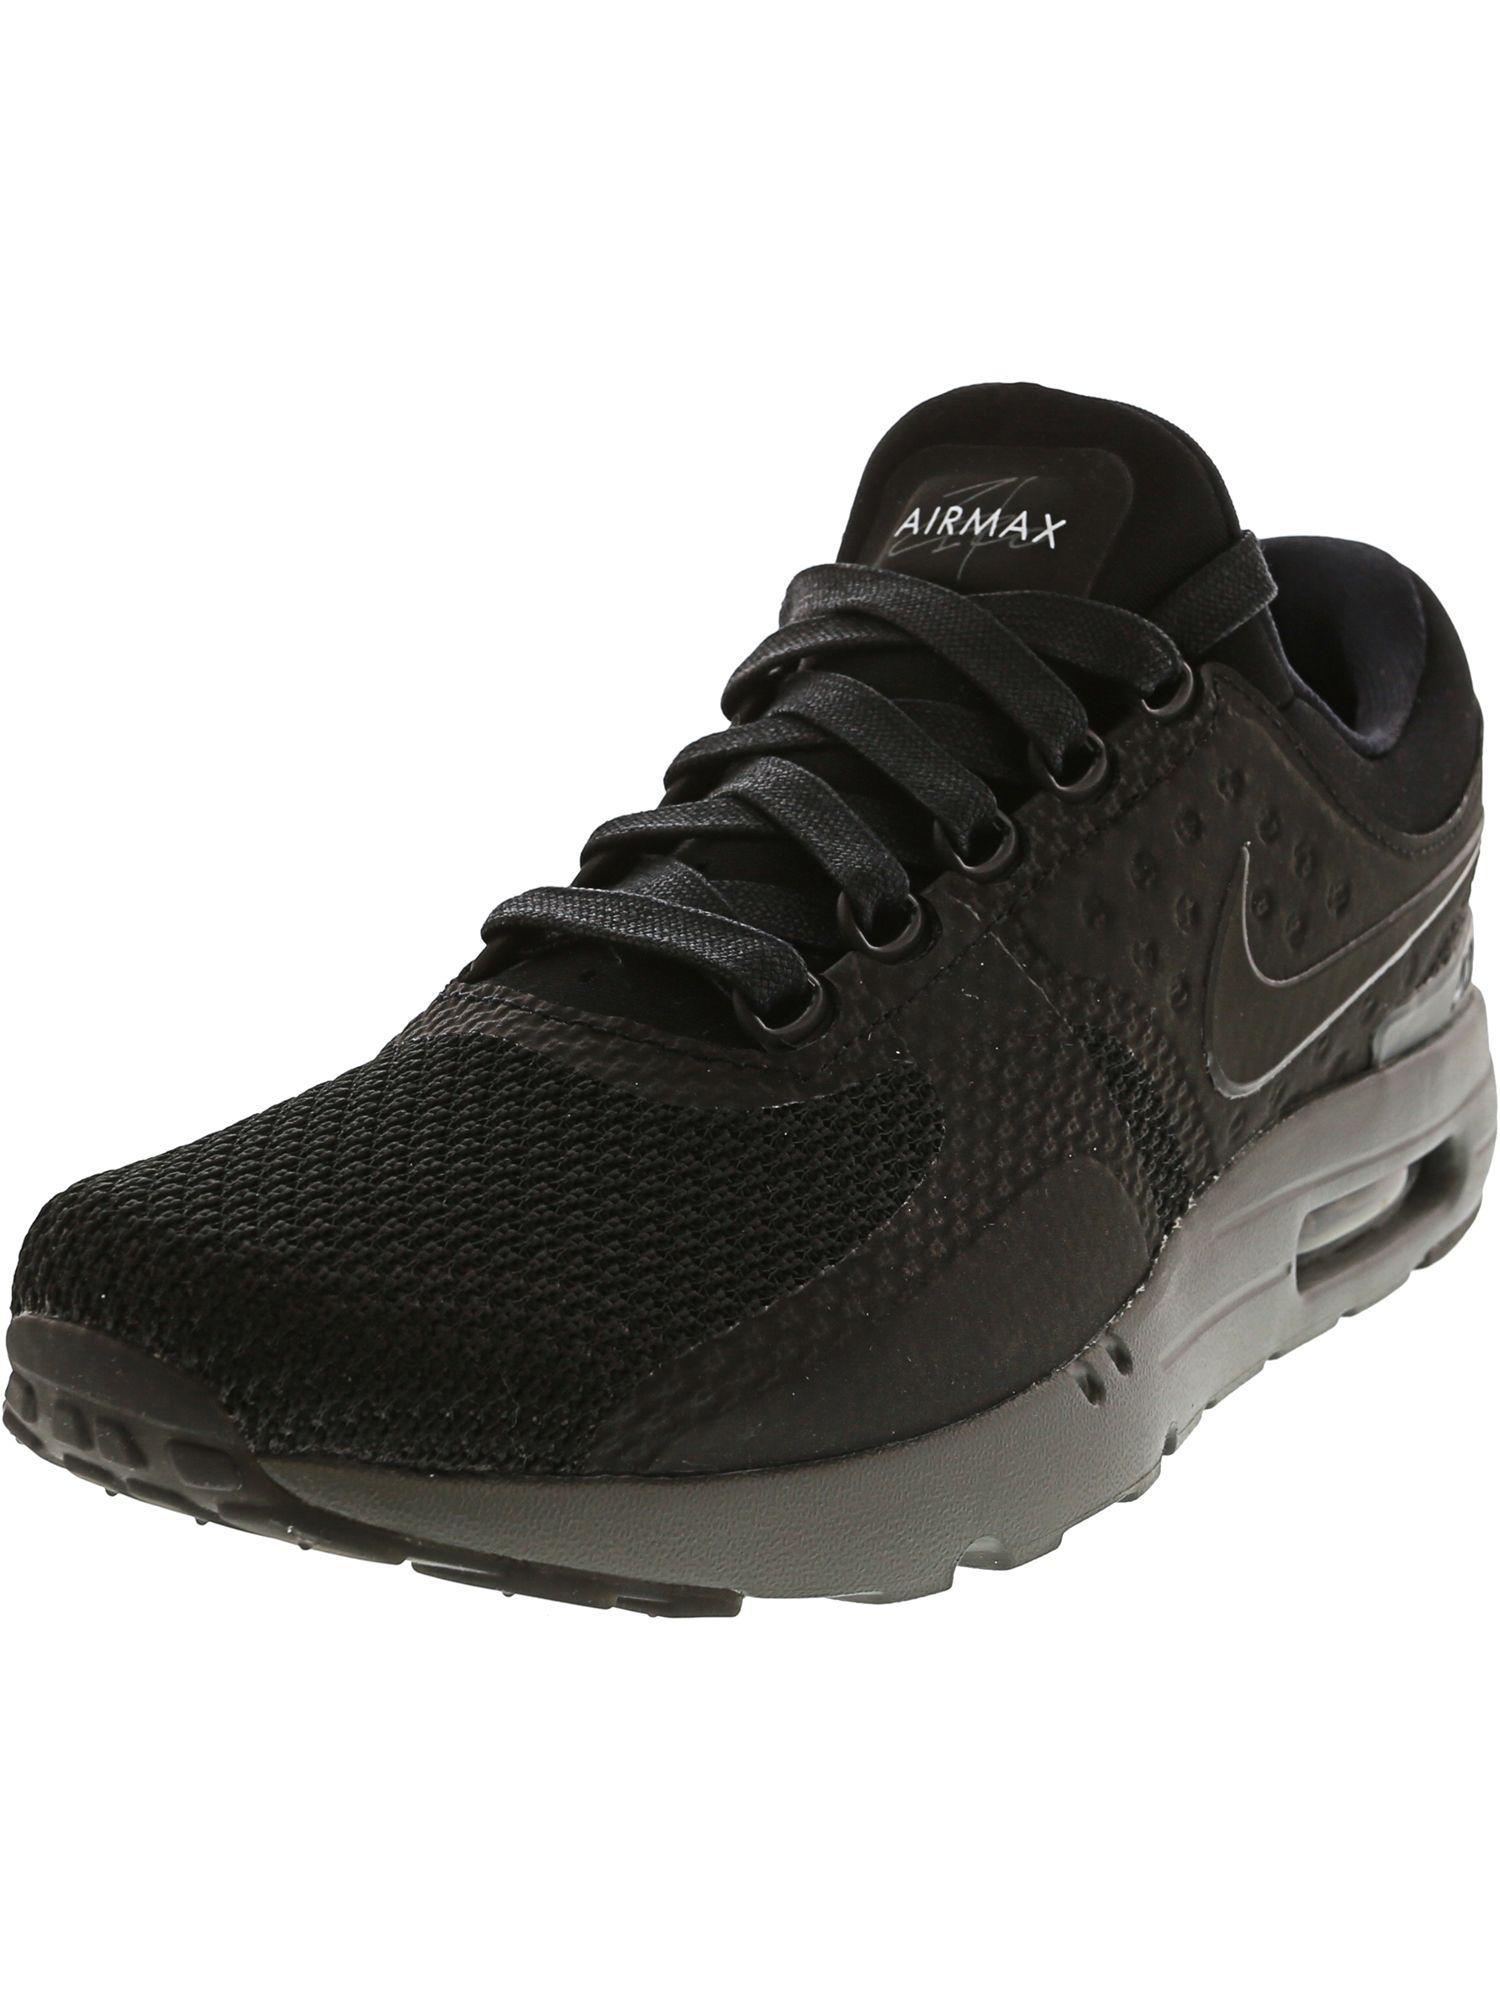 buy popular 9bfc4 2d61f Nike. Black Men s Air Max Zero Ankle-high Fabric Running Shoe